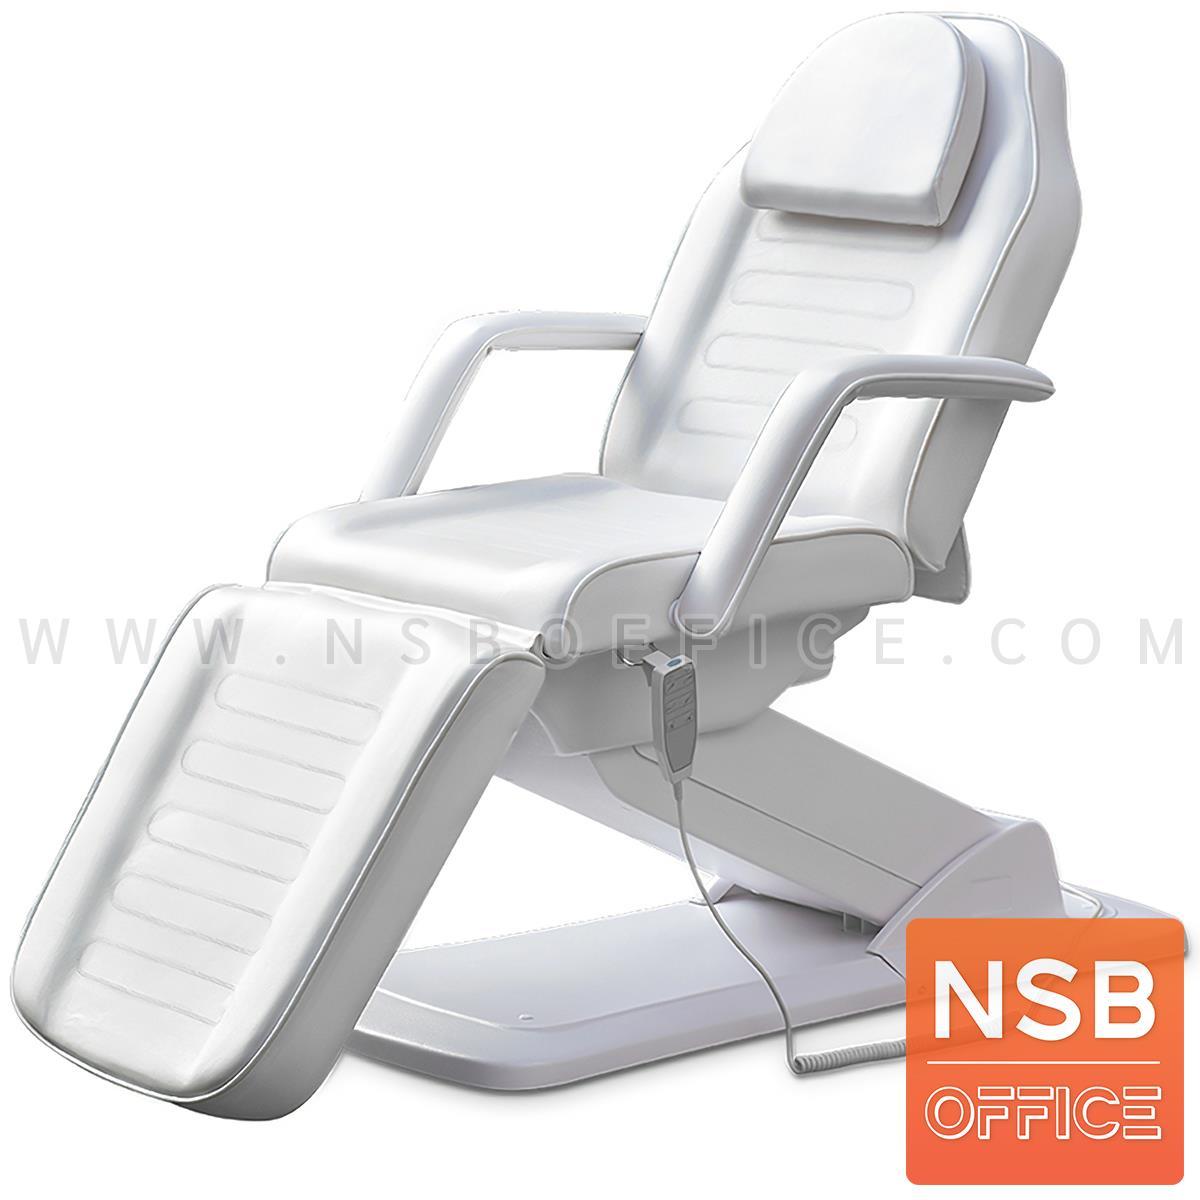 B32A003:เตียงคลินิกปรับไฟฟ้า รุ่น Grandes  ปรับนอนได้